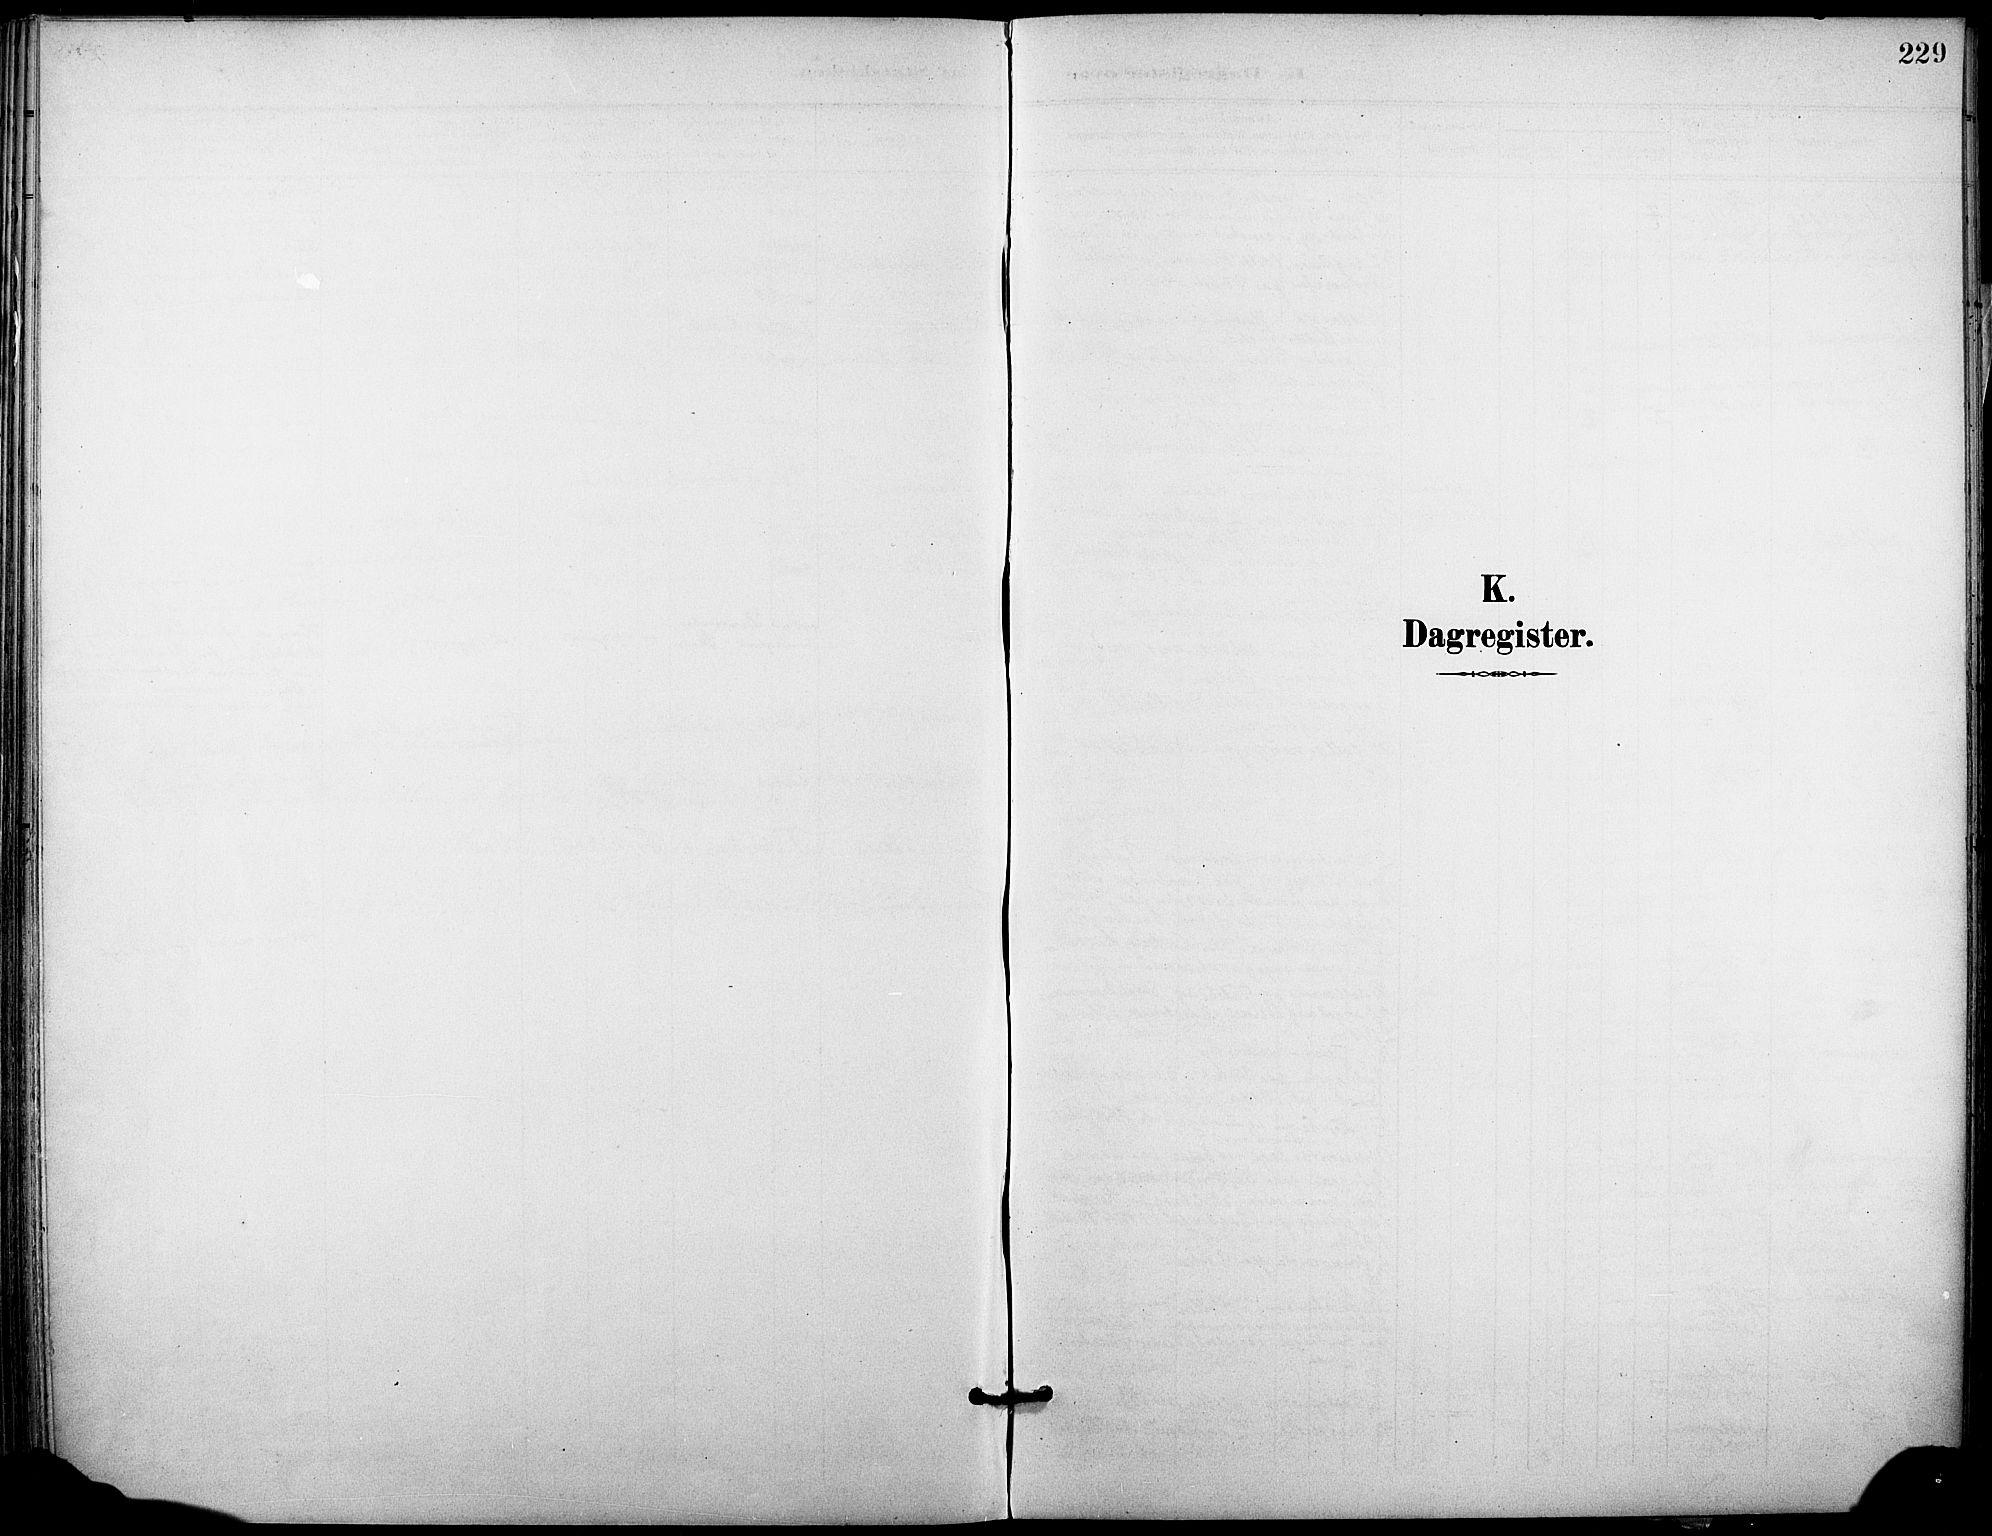 SAKO, Holla kirkebøker, F/Fa/L0010: Ministerialbok nr. 10, 1897-1907, s. 229